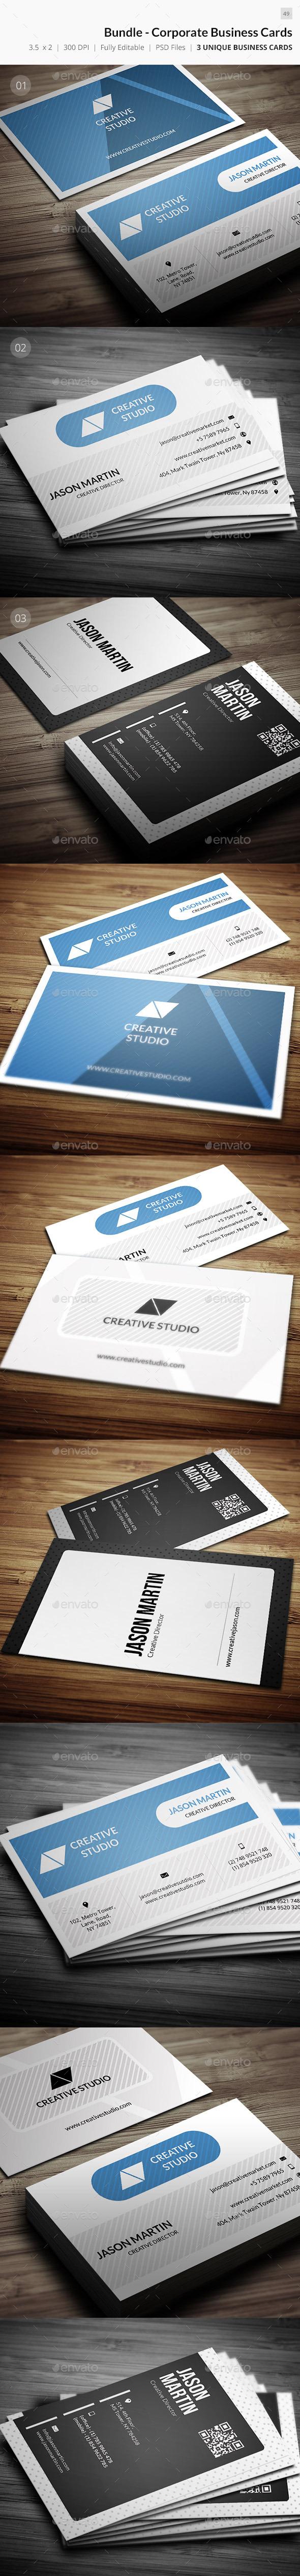 Bundle - Corporate Business Cards - 49 - Corporate Business Cards